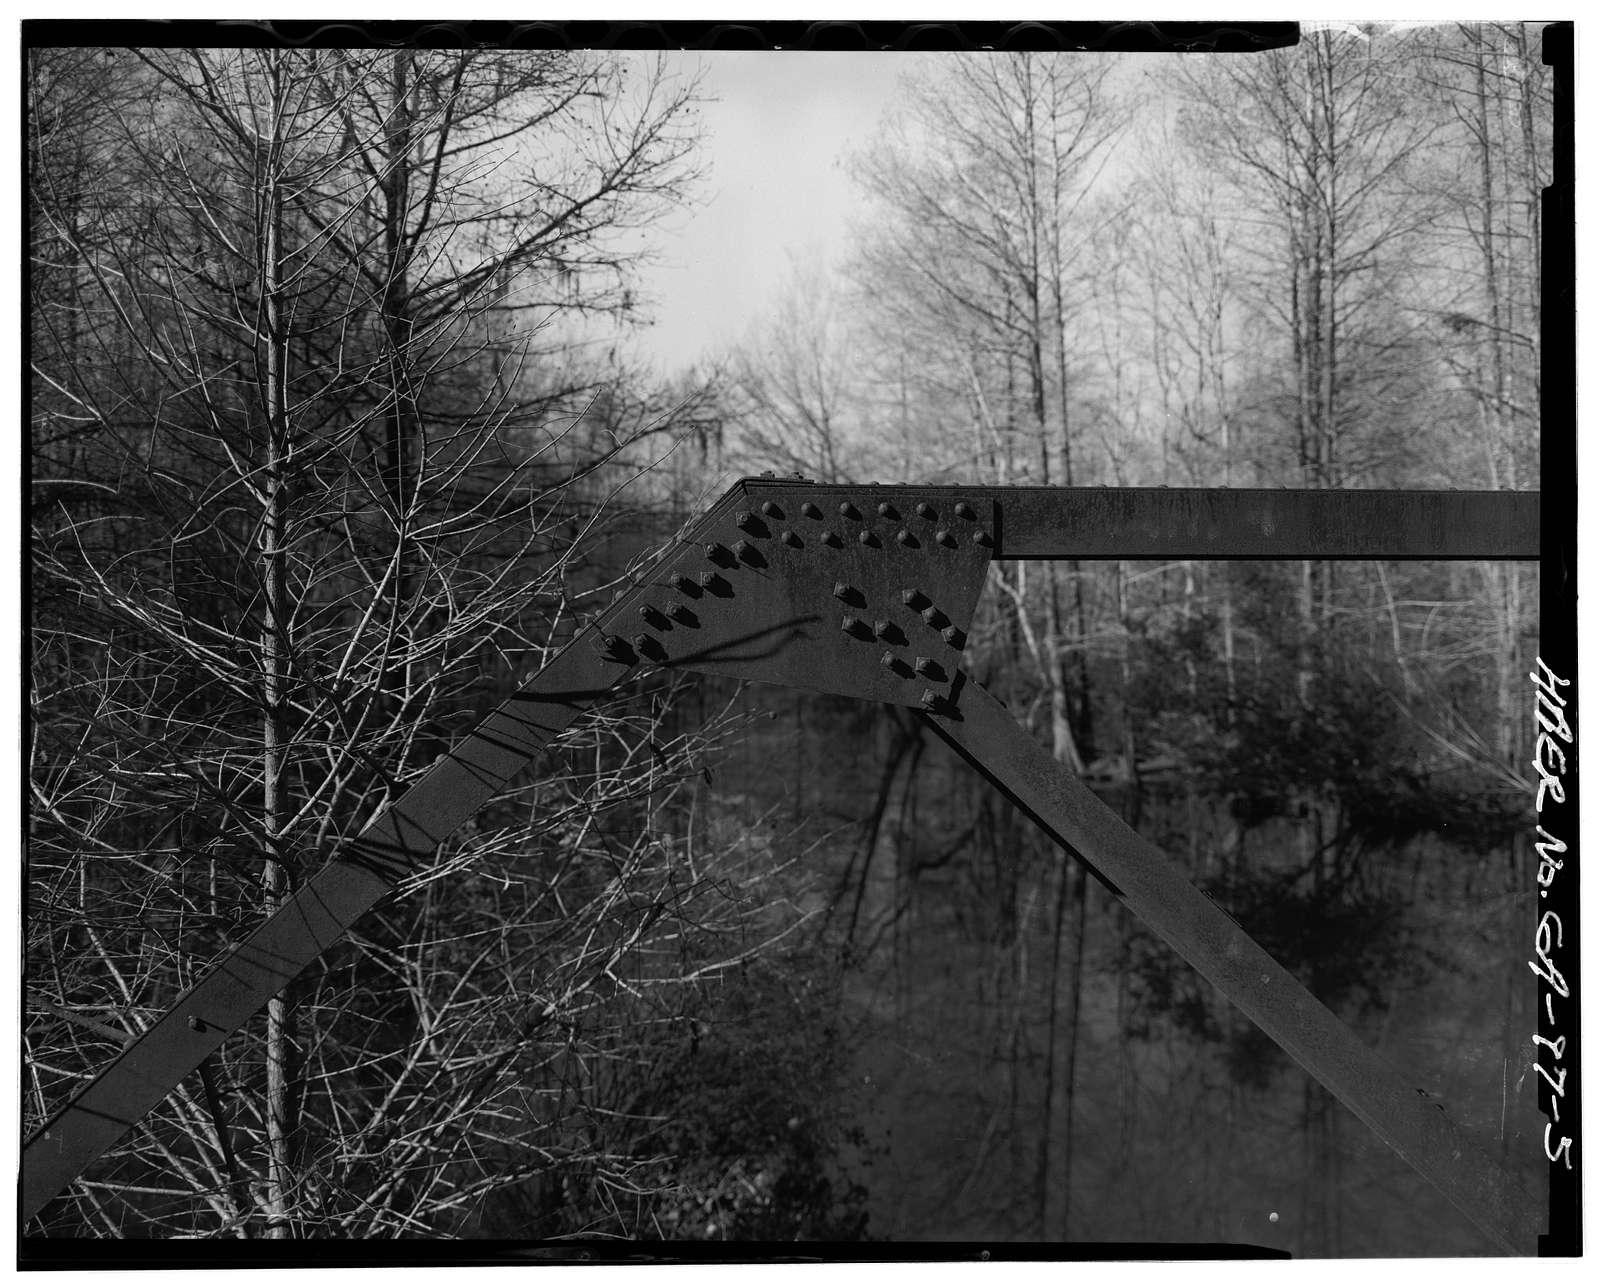 Georgia DOT Bridge No. 321-00297X-00255N, County Road 297 spanning Swift Creek, Warwick, Worth County, GA